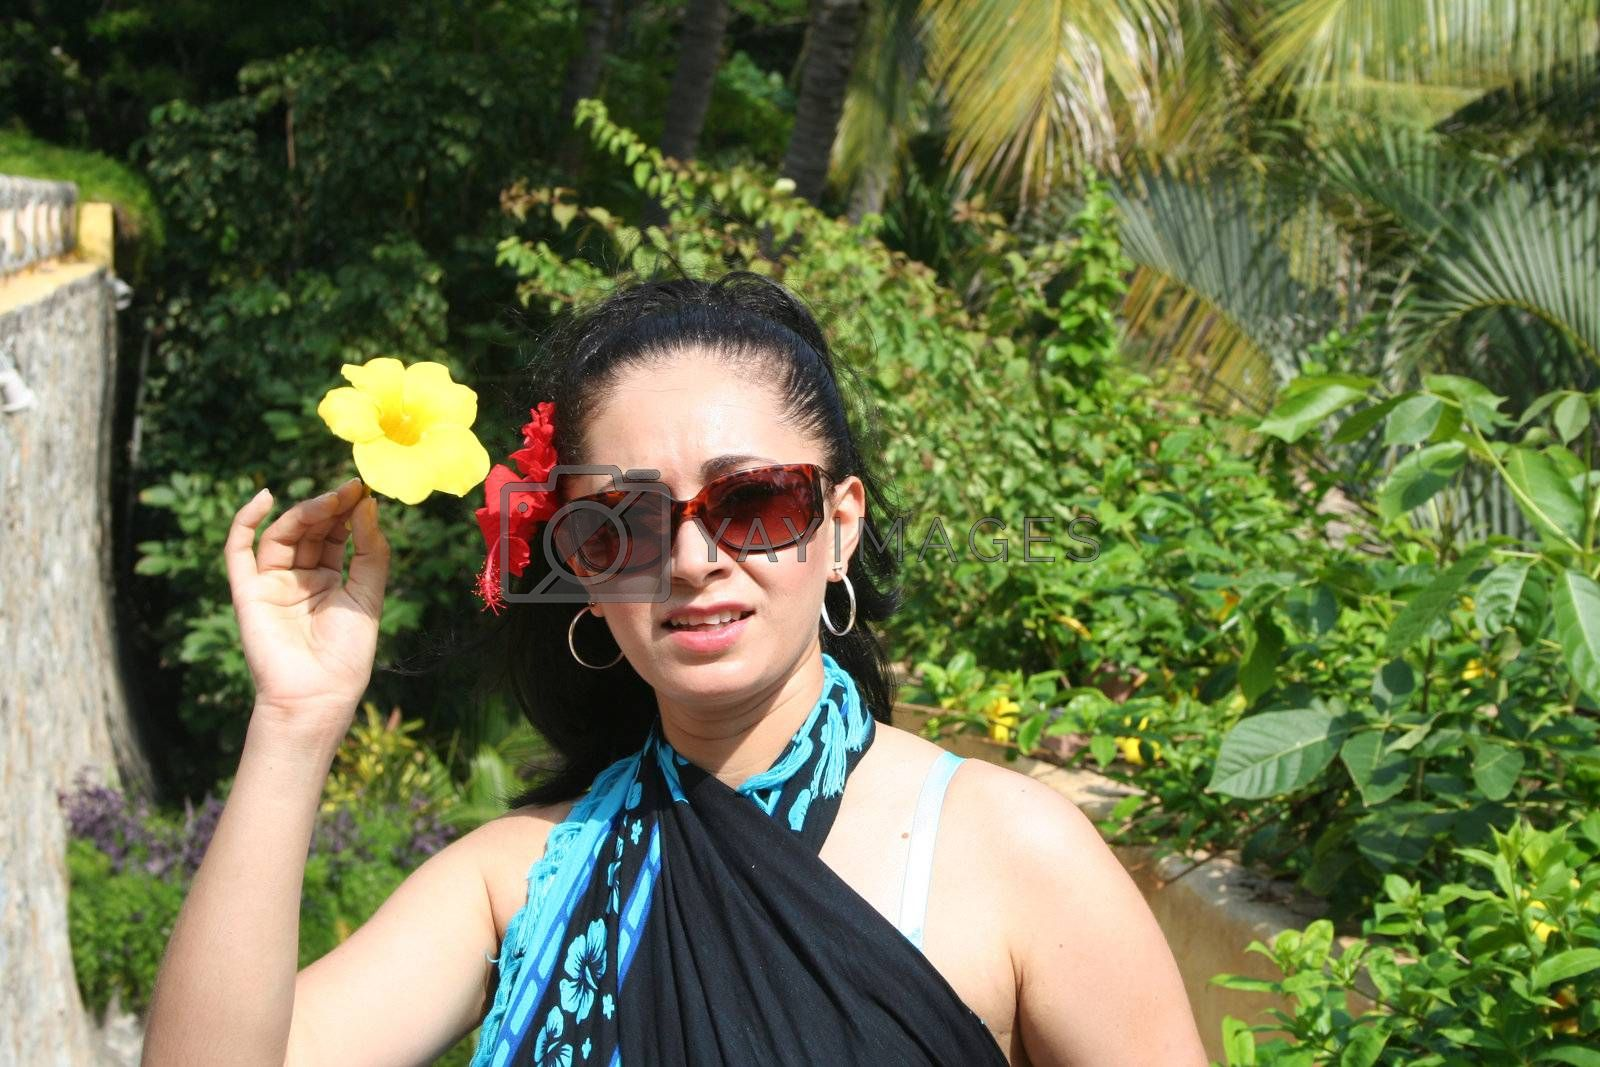 Young Latin woman at tropical setting